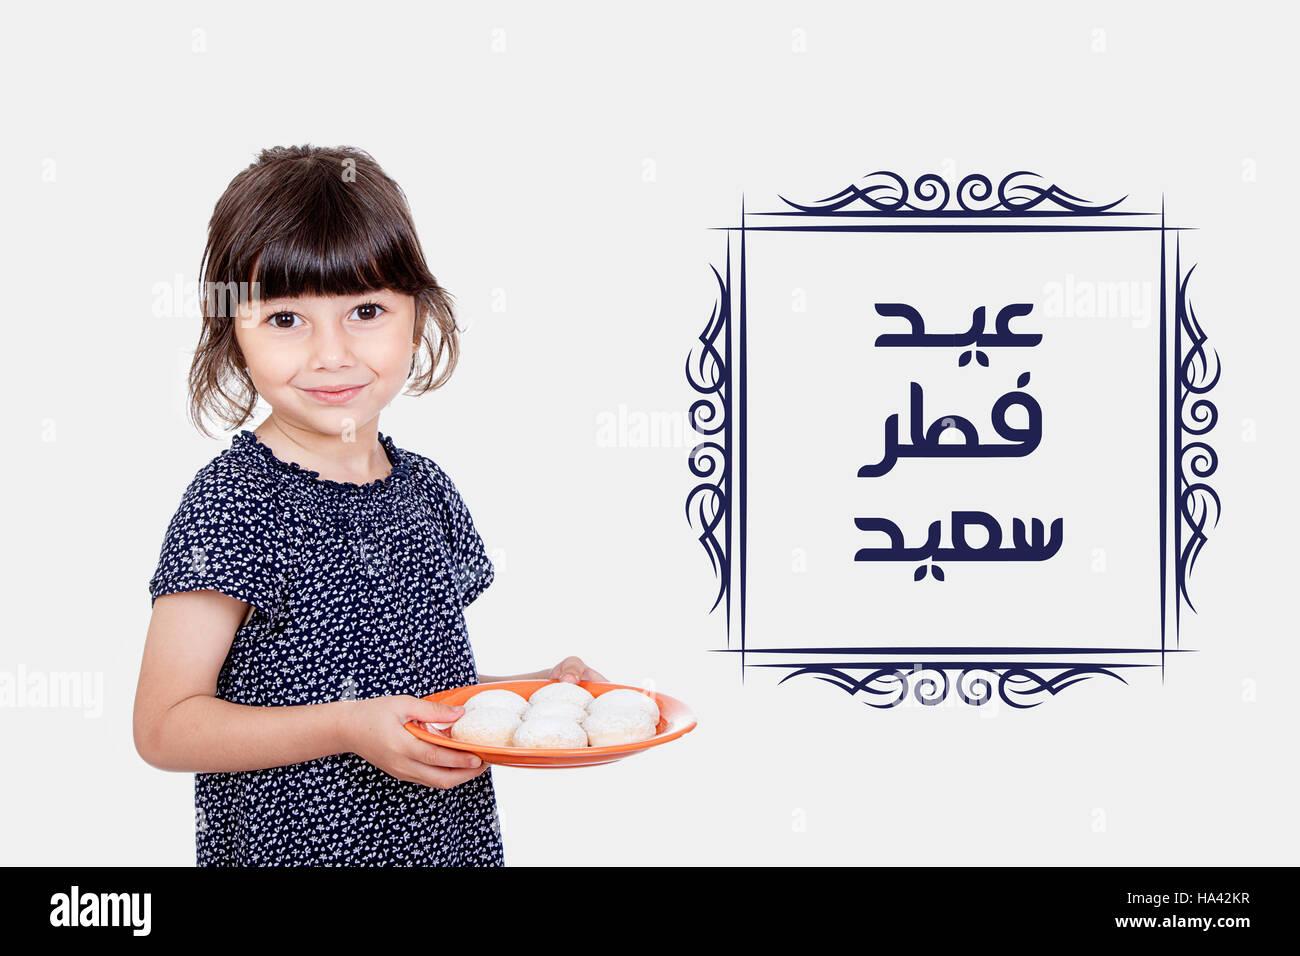 Eid El Fitr Greeting Card - Happy Feast - Stock Image